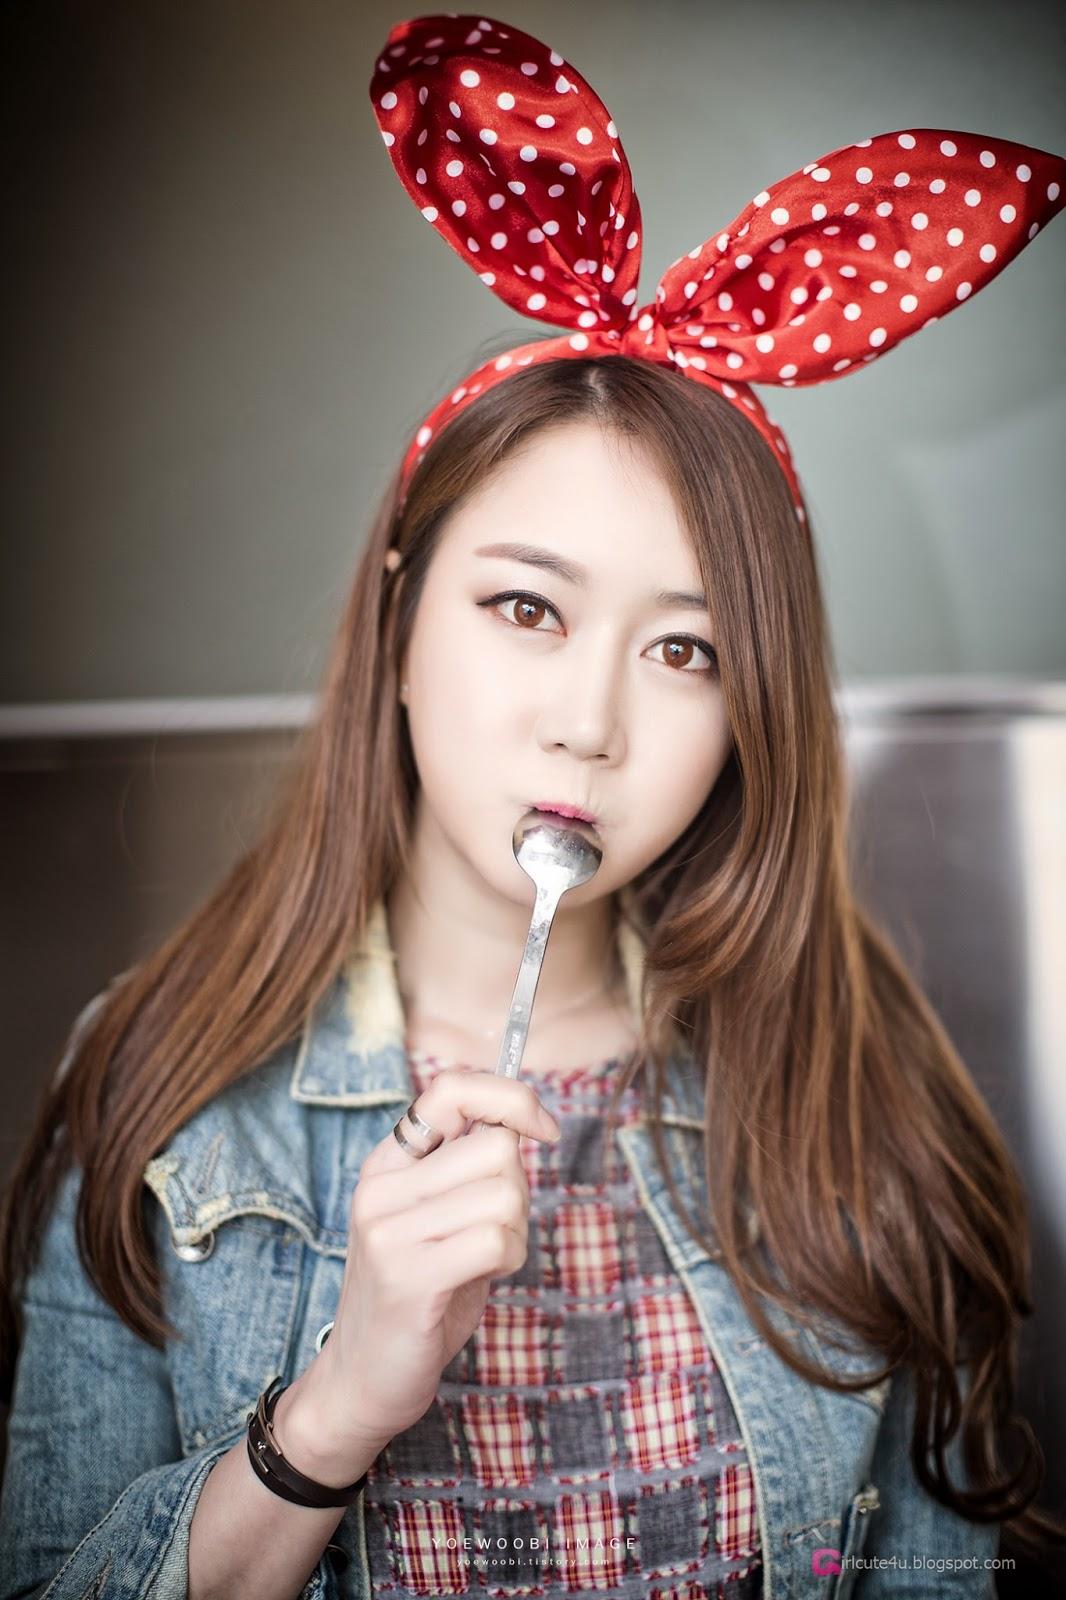 2 Han Chae Yee - IN-N-OUT - very cute asian girl-girlcute4u.blogspot.com